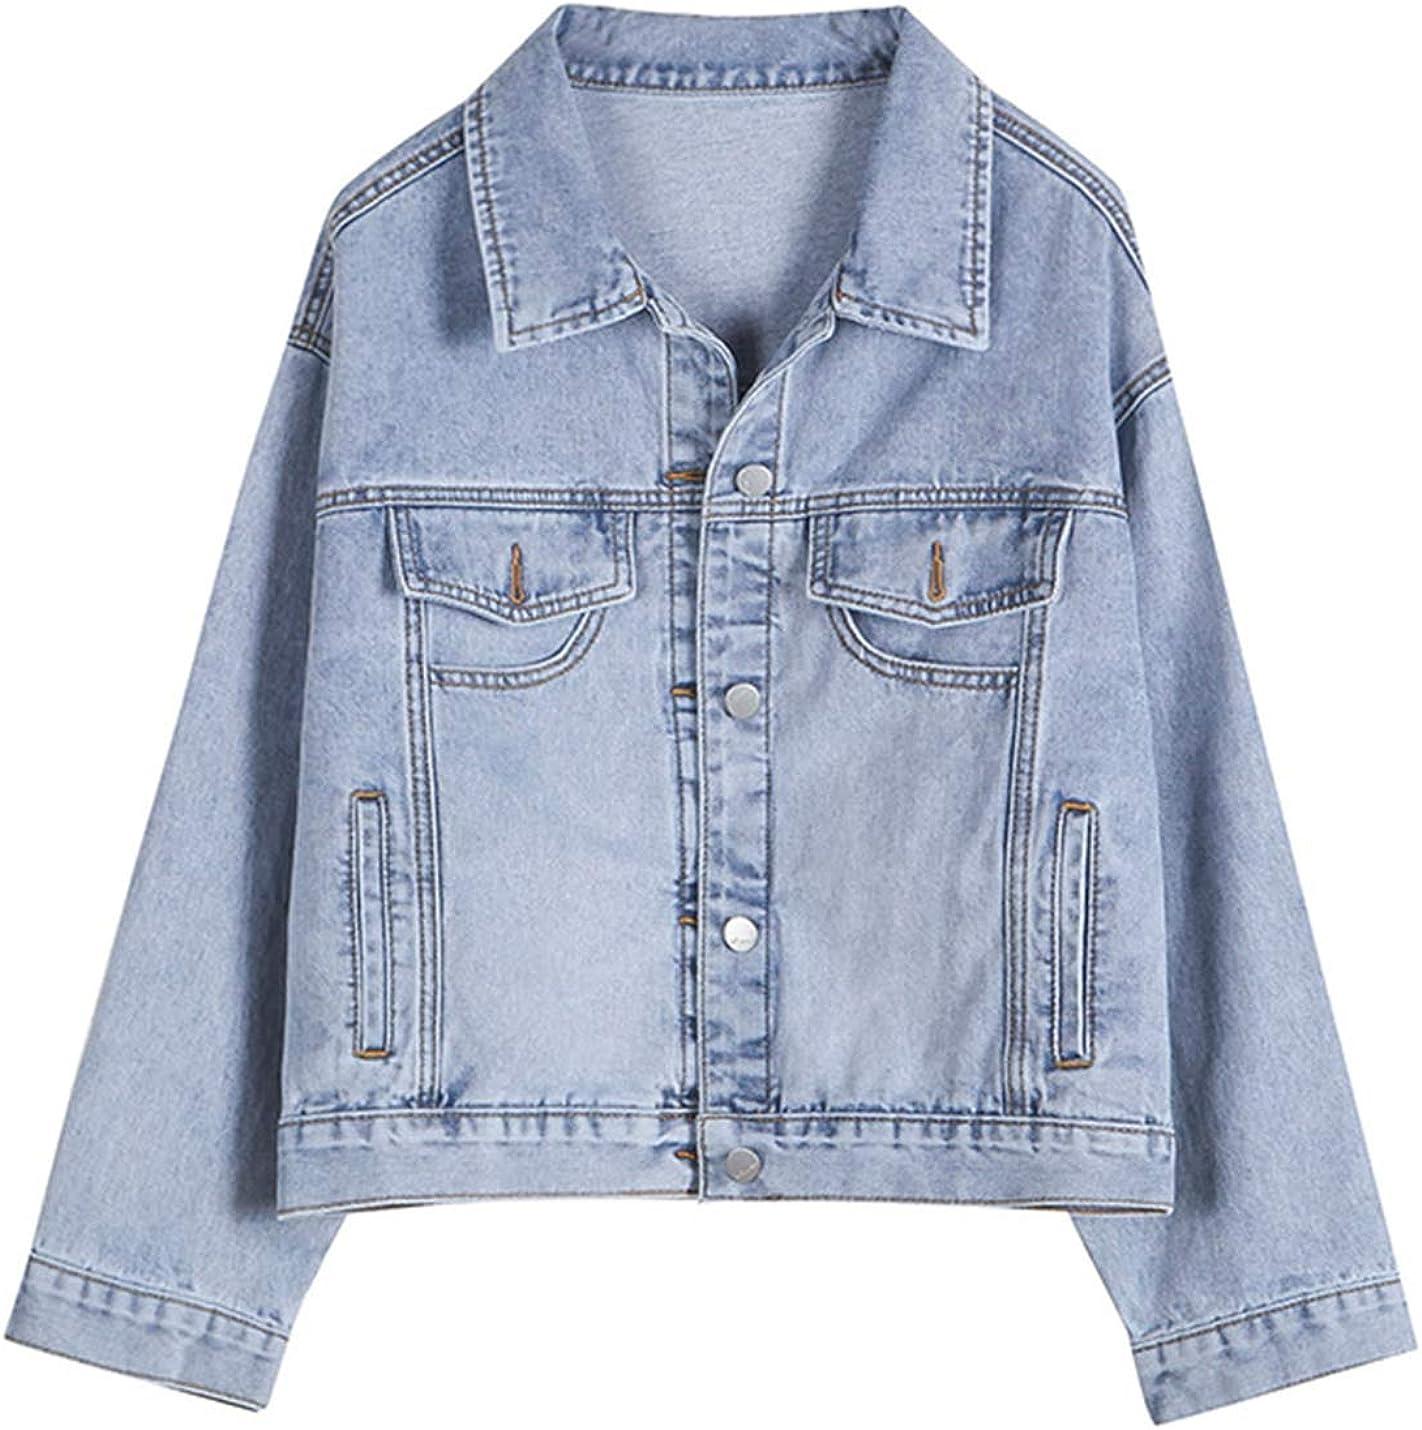 Gihuo Women's Casual Loose Button Boyfriend Long Sleeve Washed Short Denim Jackets